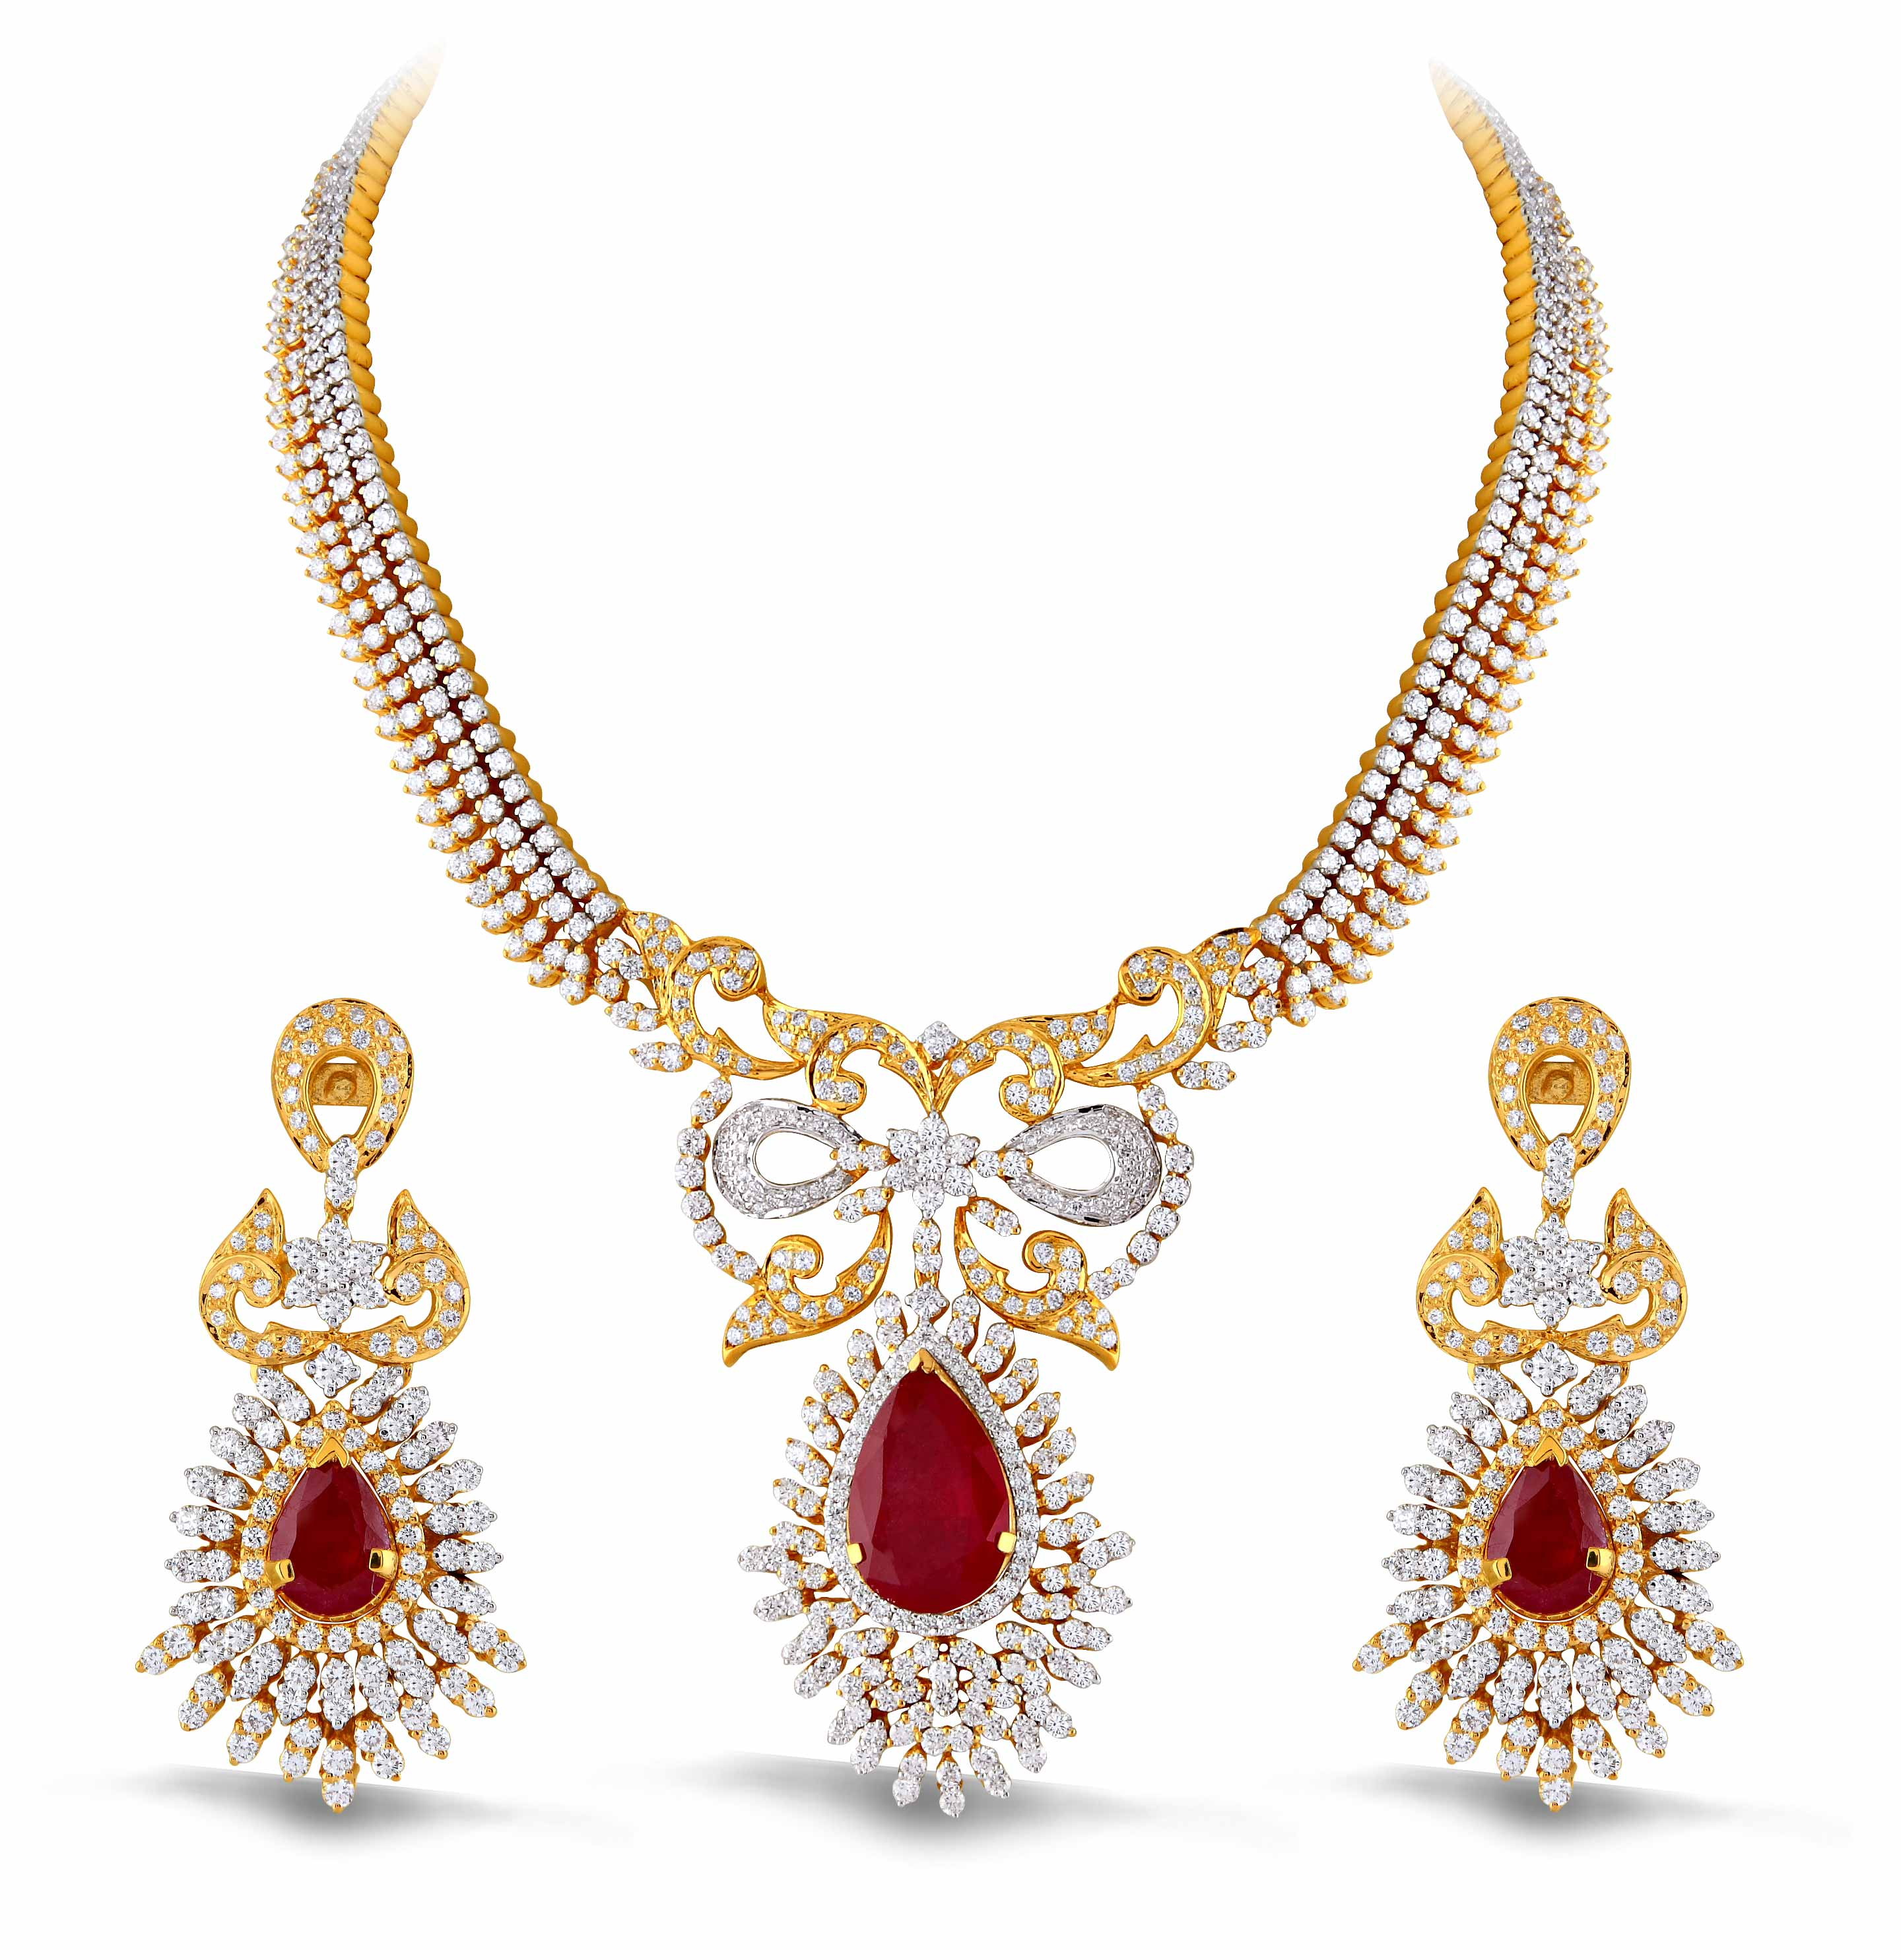 Apara Bridal Pearl Lct Stones Gold Necklace Set Jewellery: [組圖+影片] 的最新詳盡資料** (必看!!) - Yes-news.com